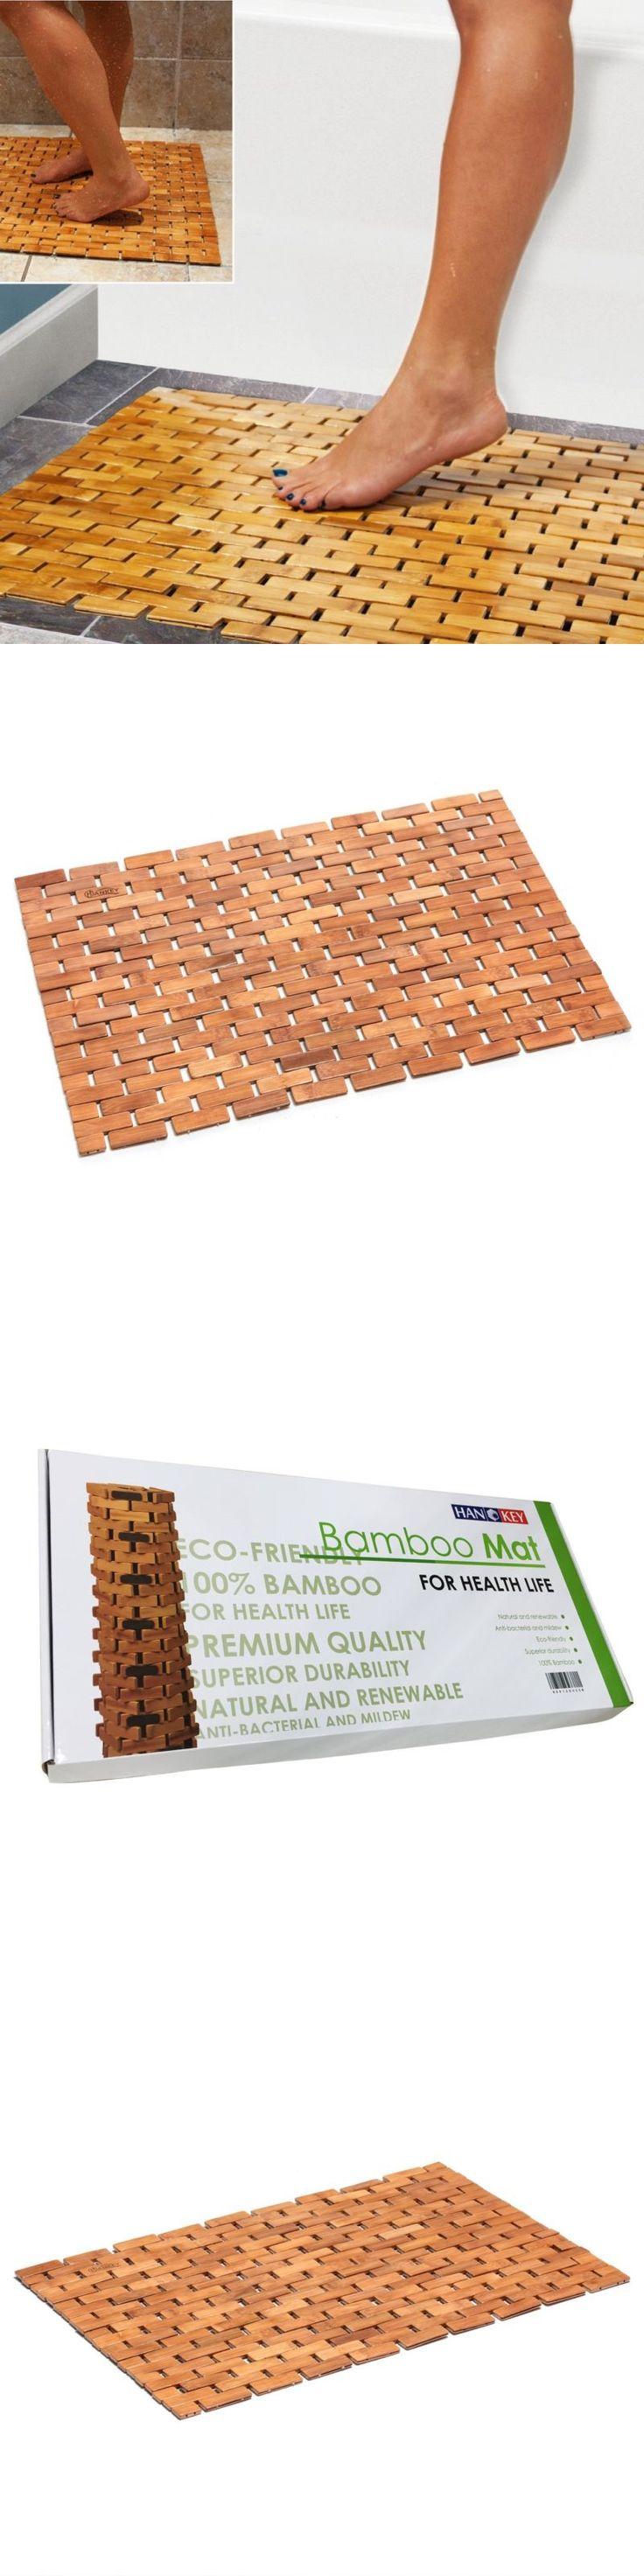 best 25 non slip shower mat ideas only on pinterest dorm non slip appliques and mats 66722 anti slip roll up bamboo floor mat